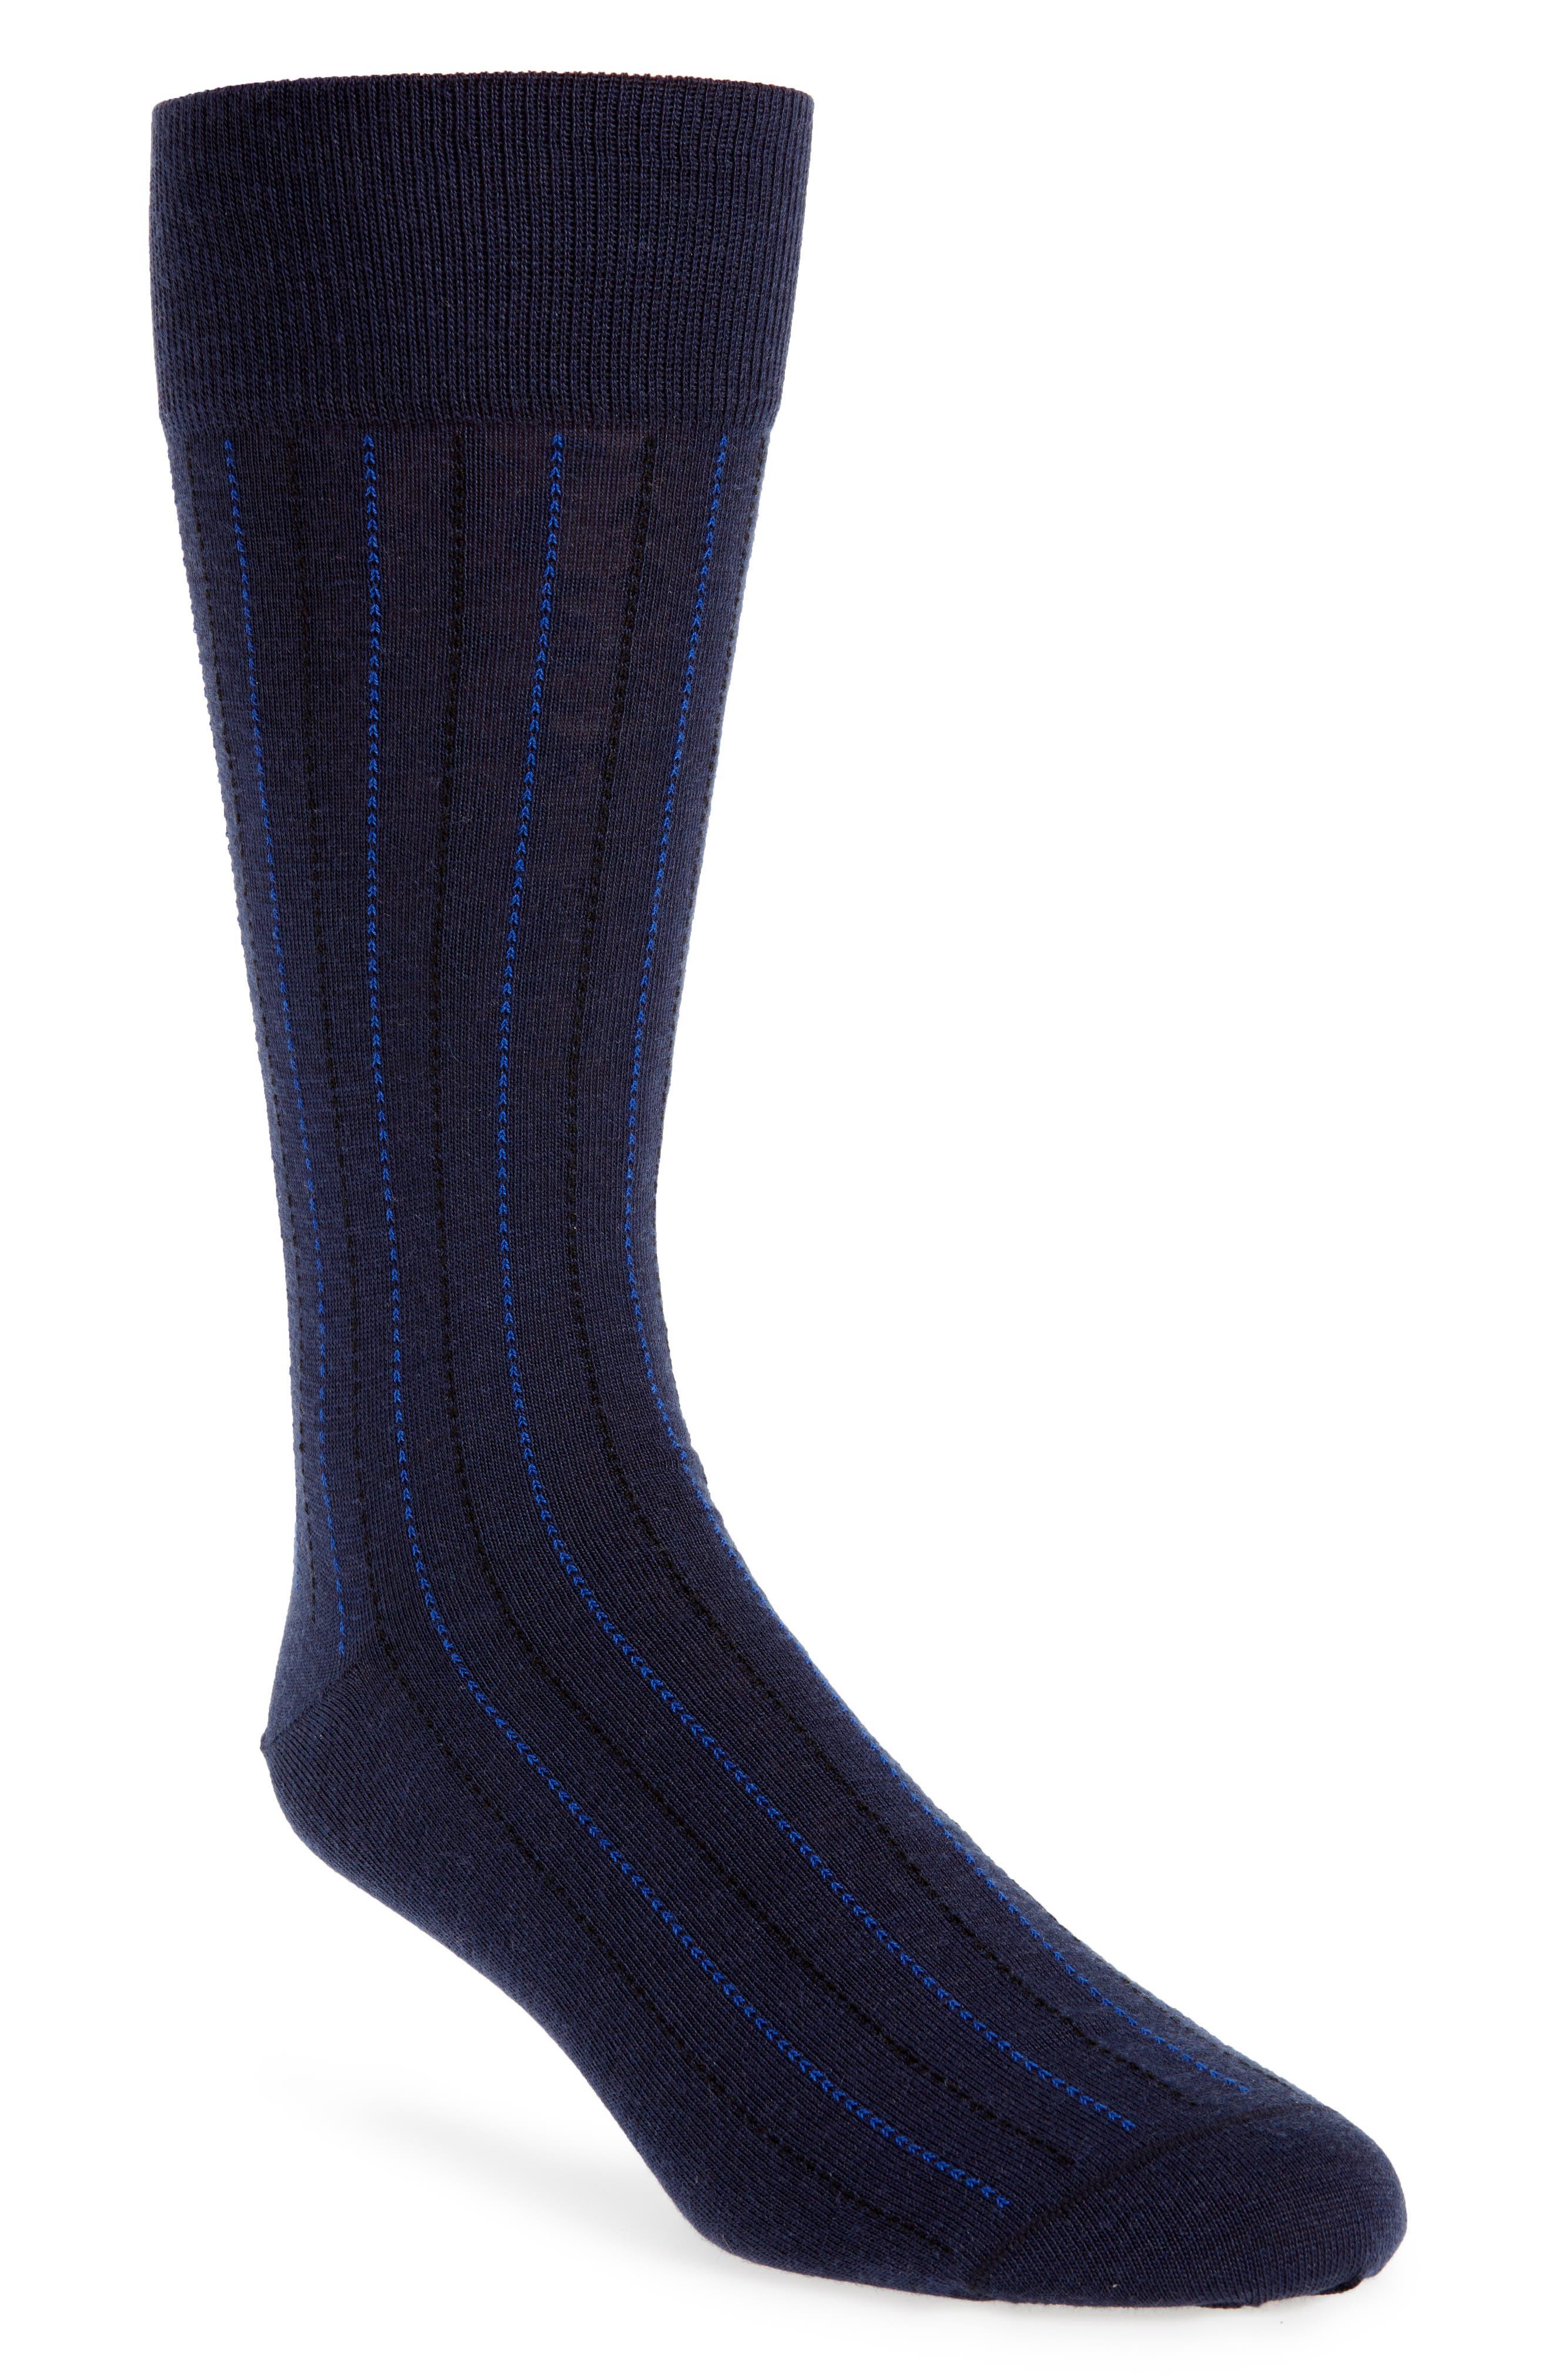 Vertical Lines Socks,                             Main thumbnail 1, color,                             Navy